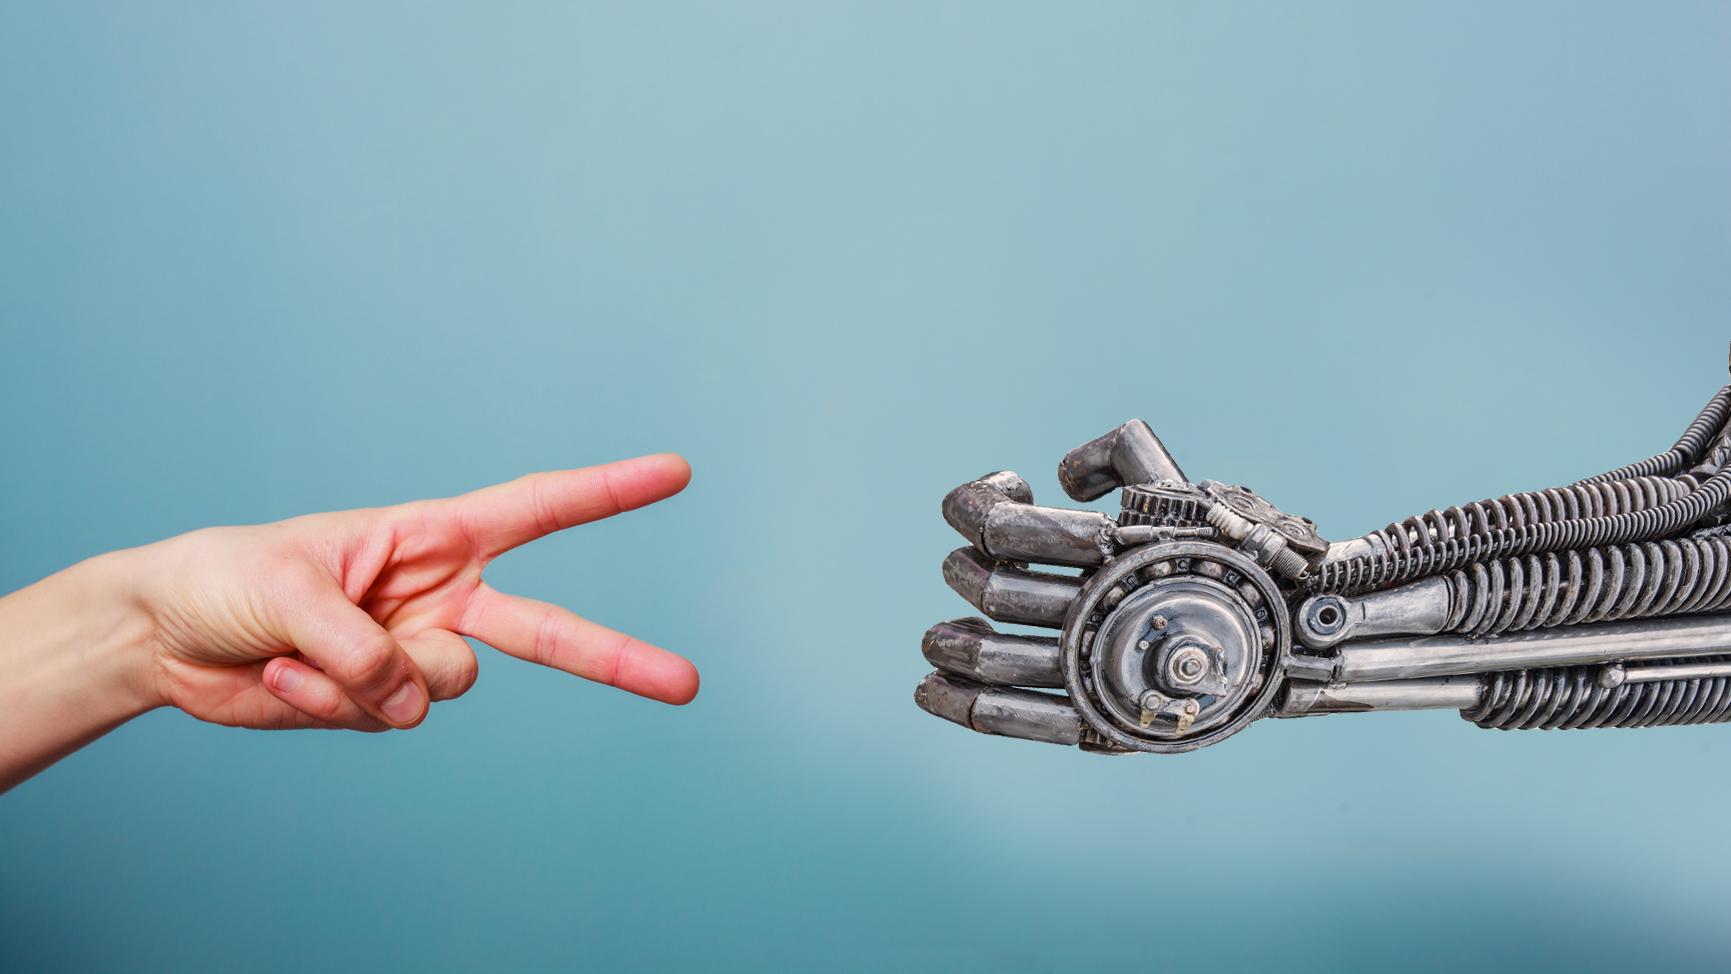 Картинки рук роботов